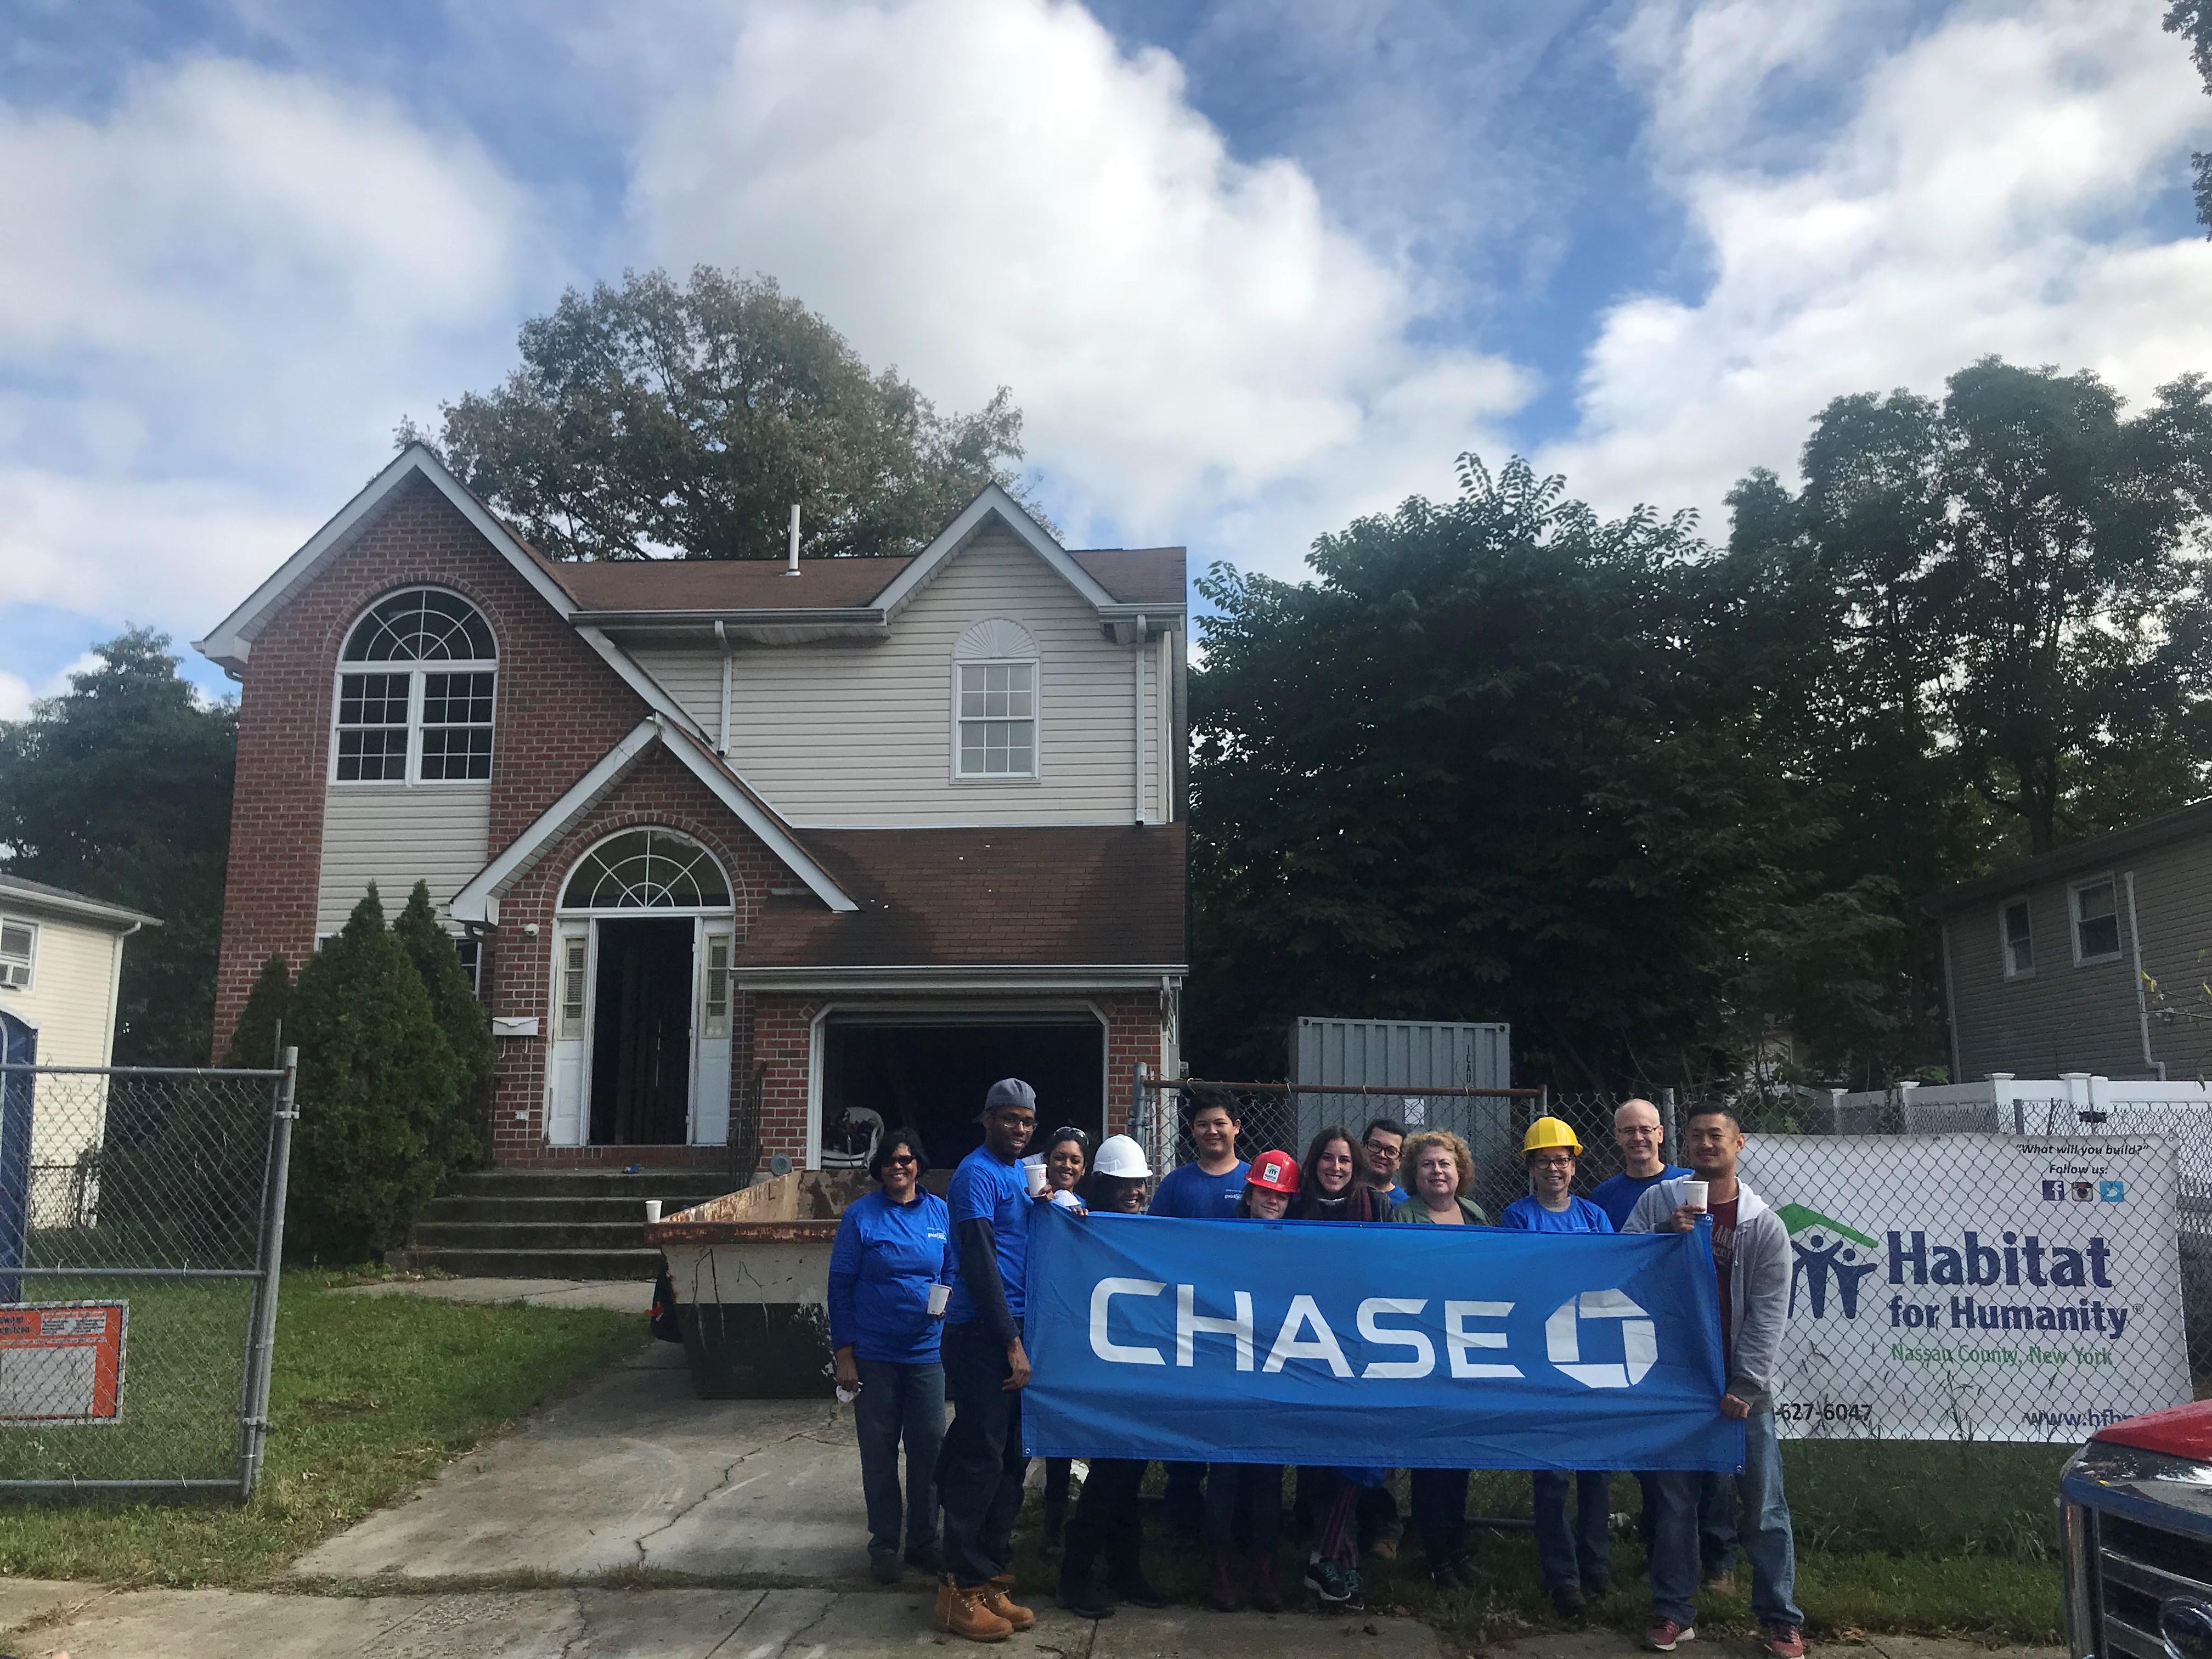 Habitat for Humanity of Nassau County, New York